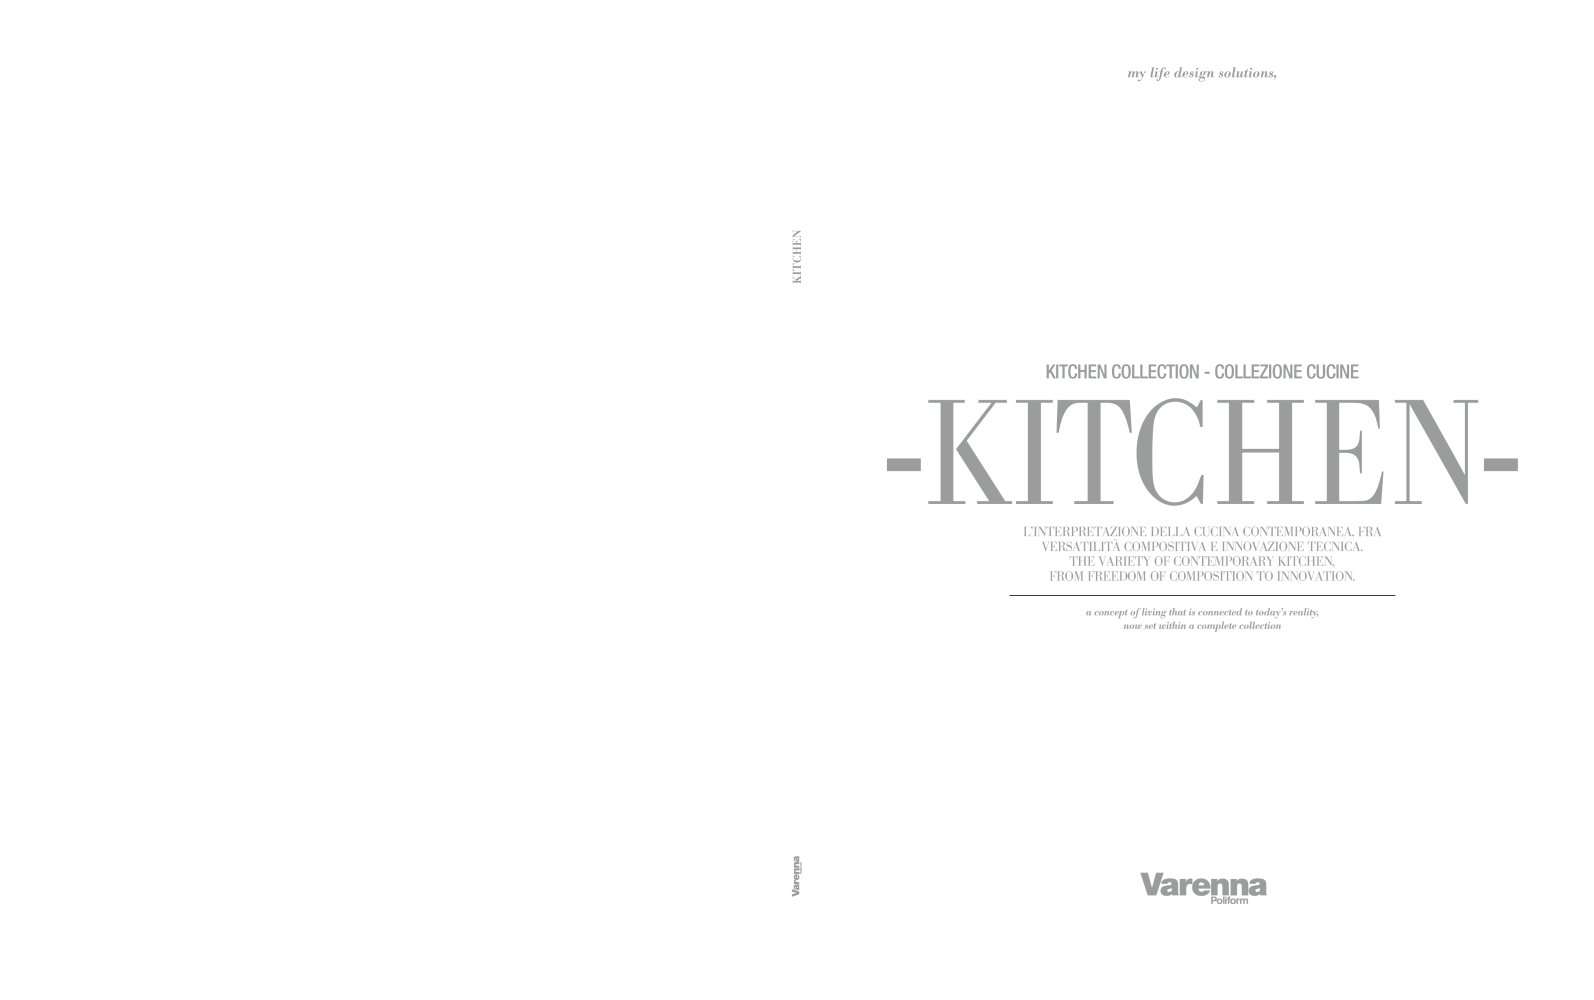 Kitchen Collection Logo Simple Kitchen Collection 2017 Sylvanian Families C To Design Ideas